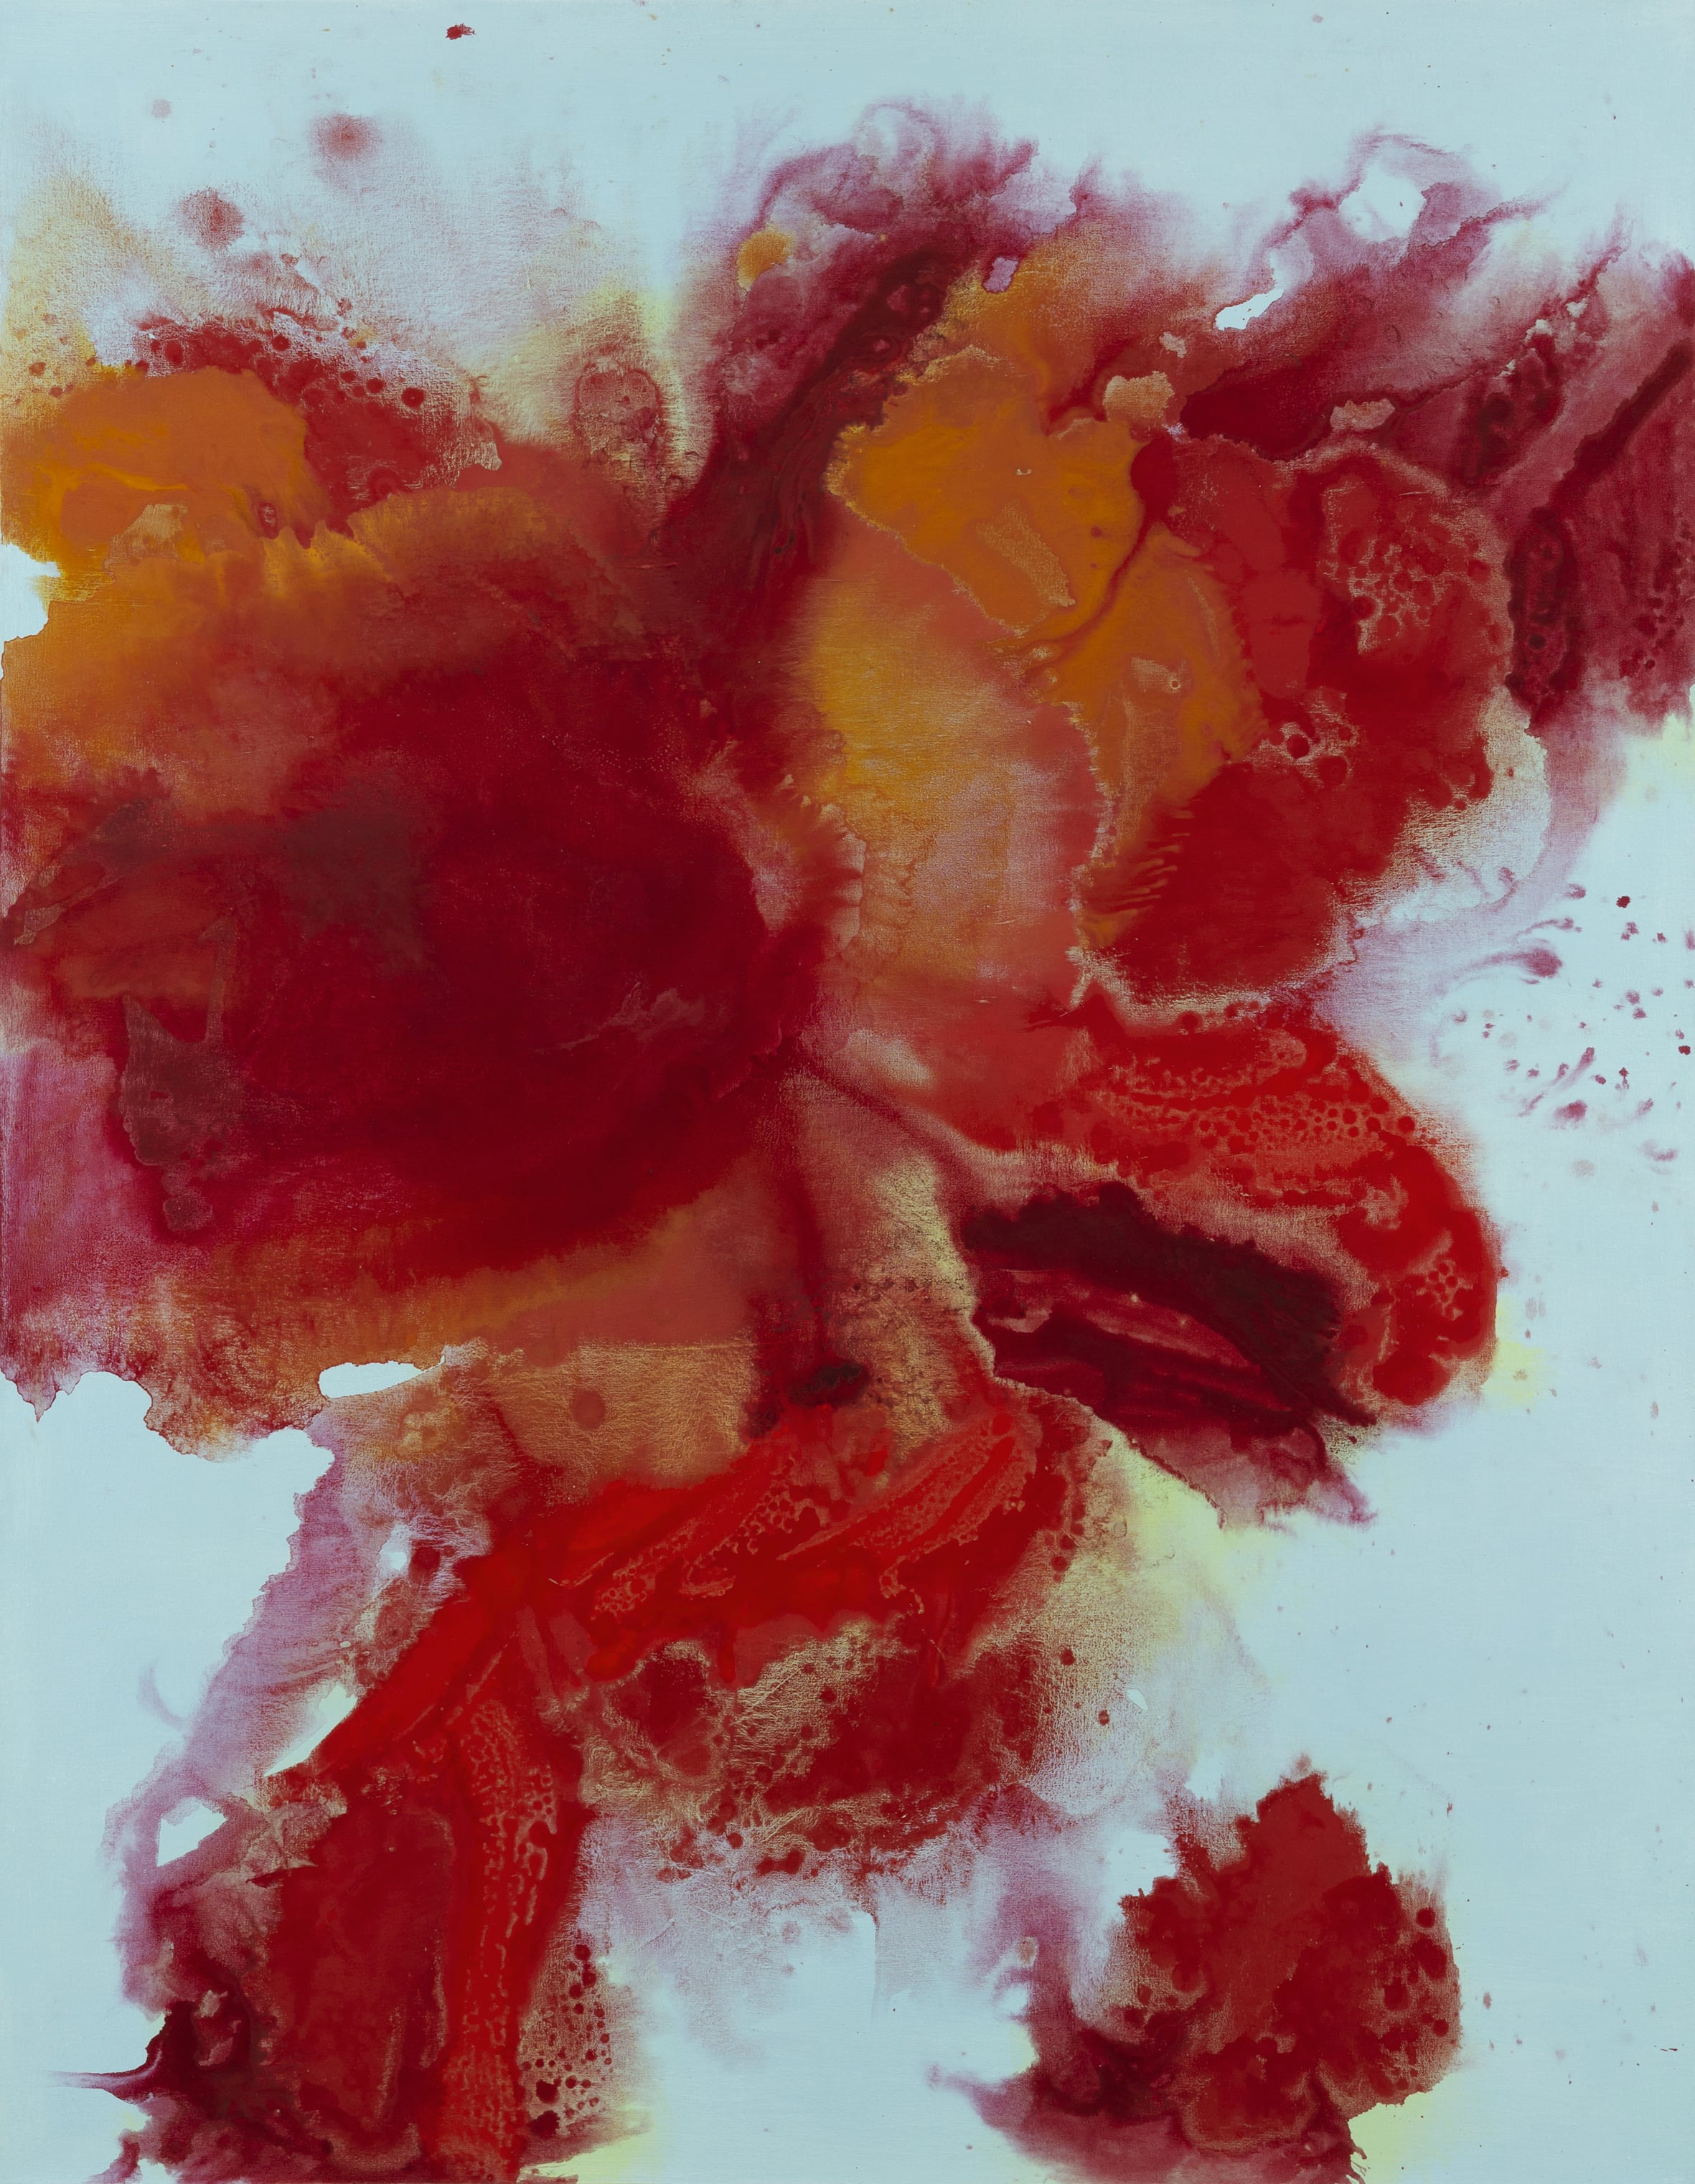 Outburst 2  2012, 135 x 105cm acrylic on canvas (SOLD)